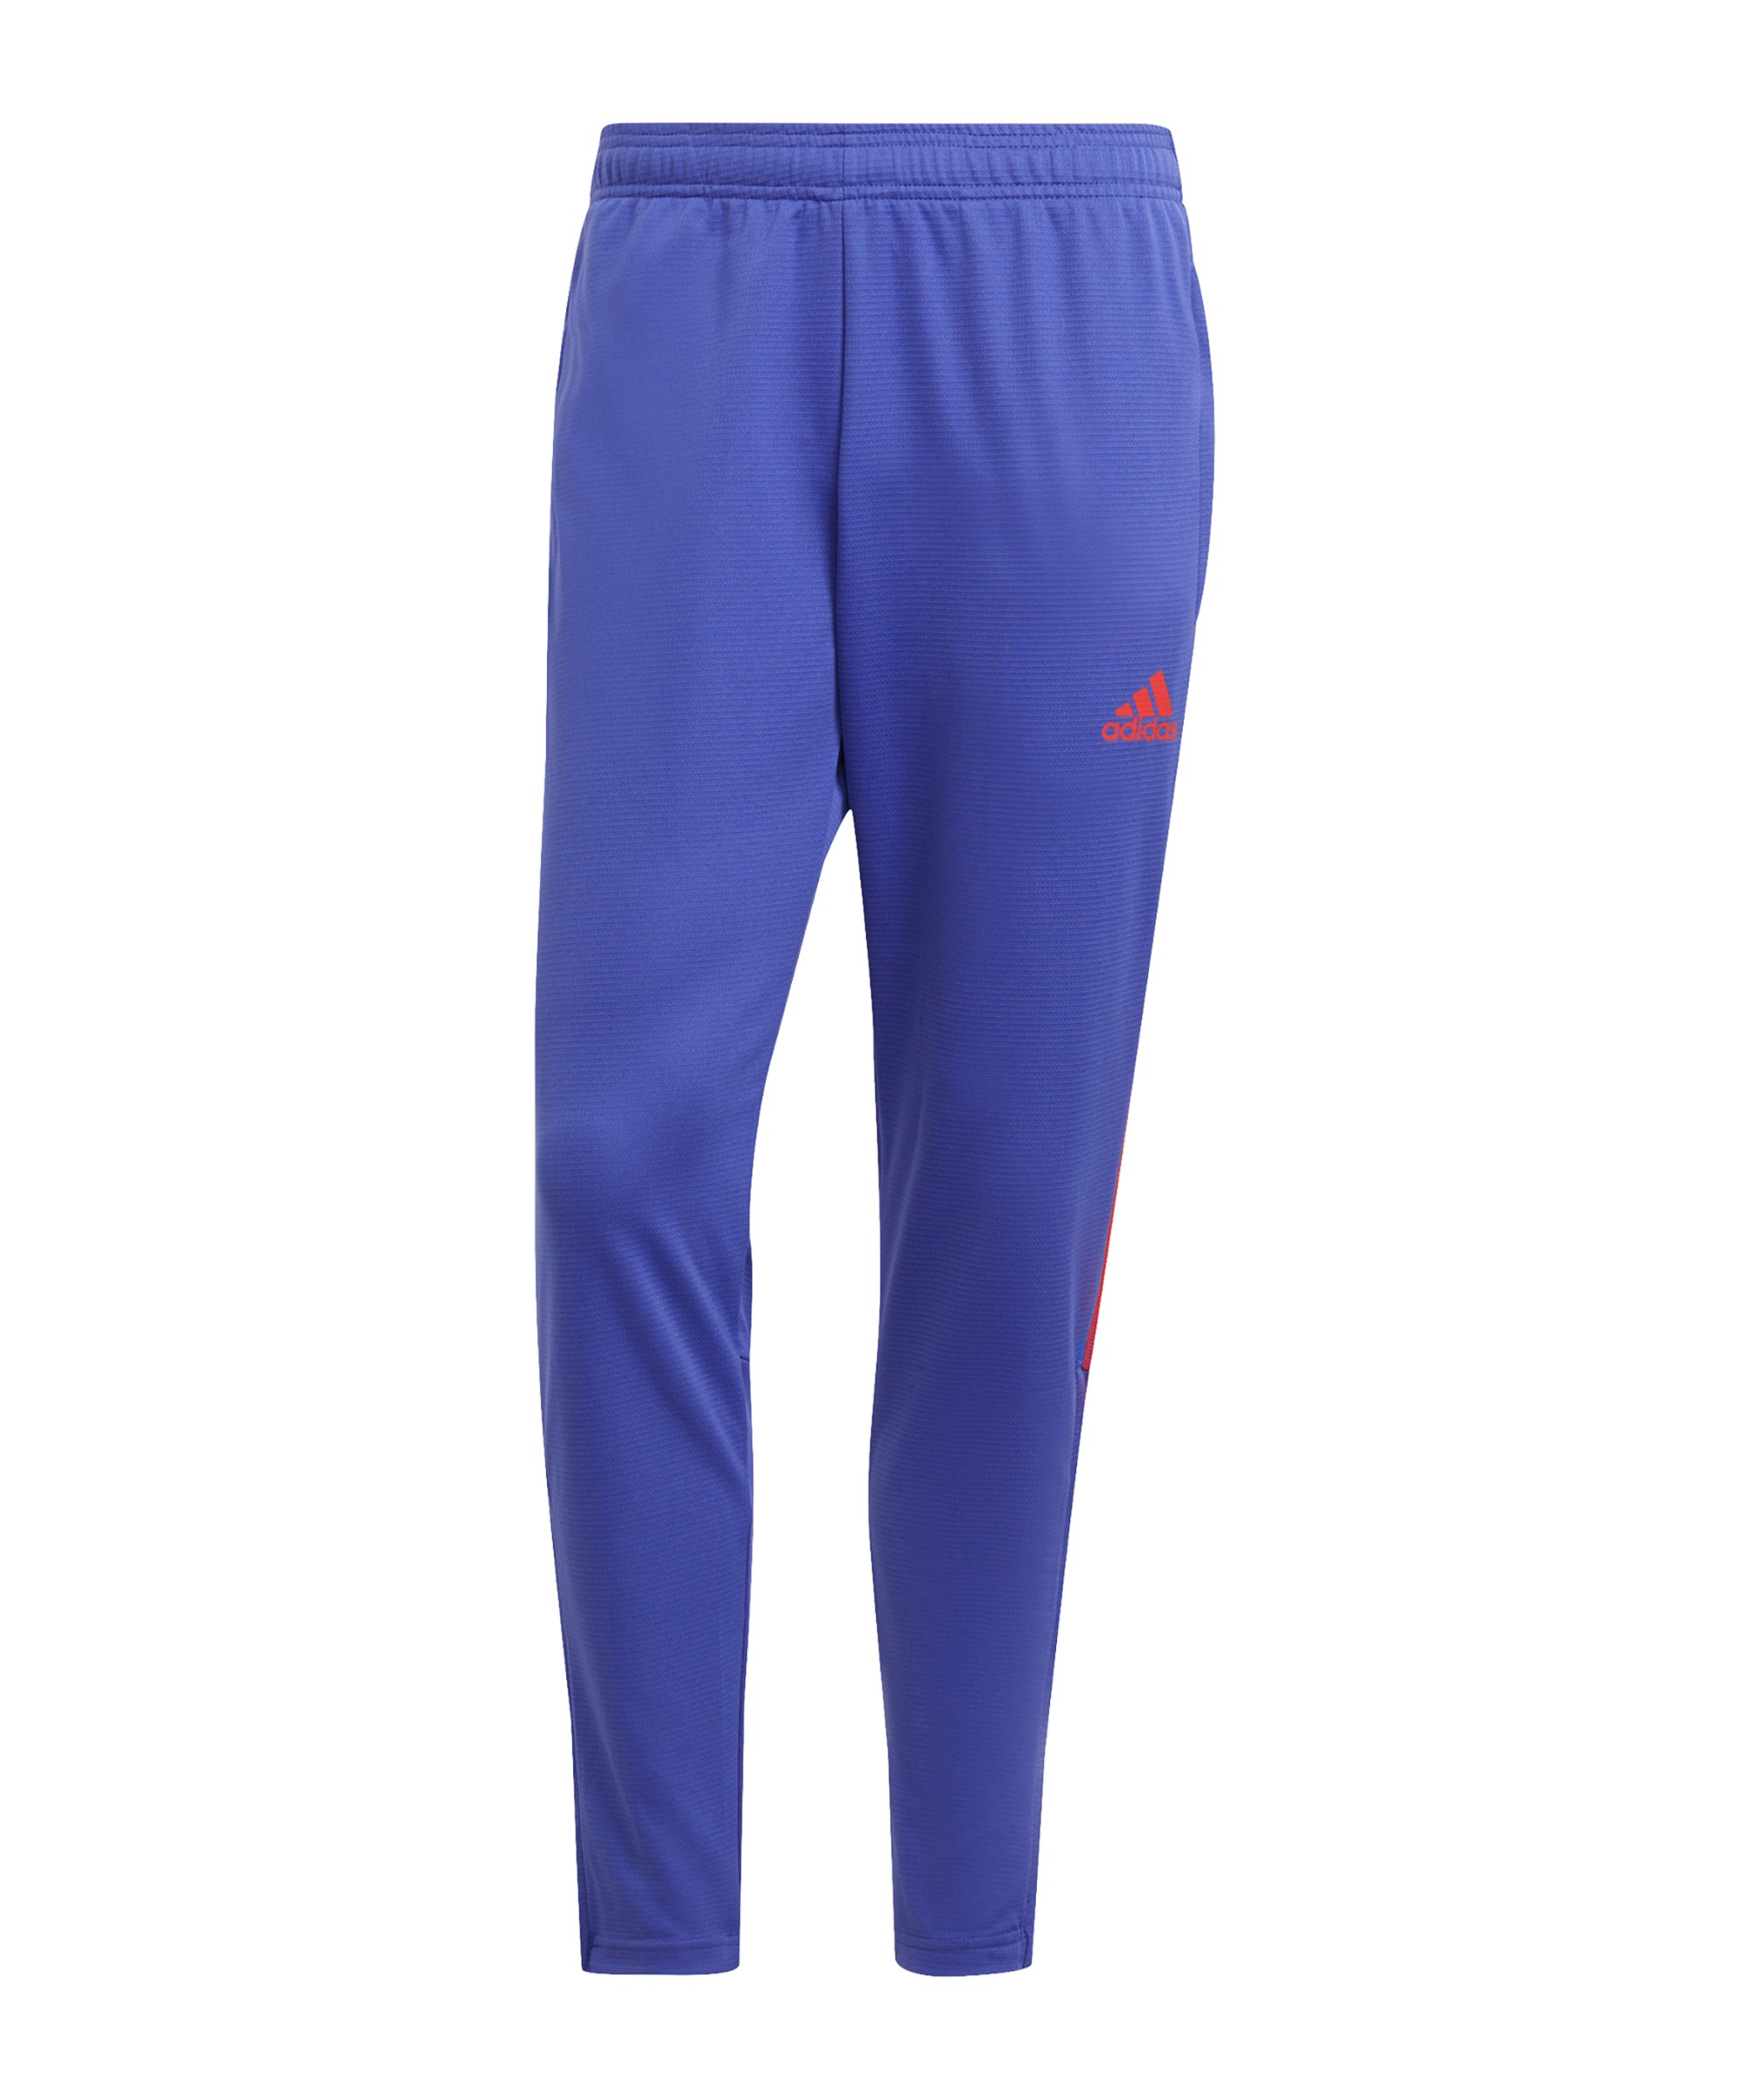 adidas Tiro Primeblue Trainingshose Blau - blau